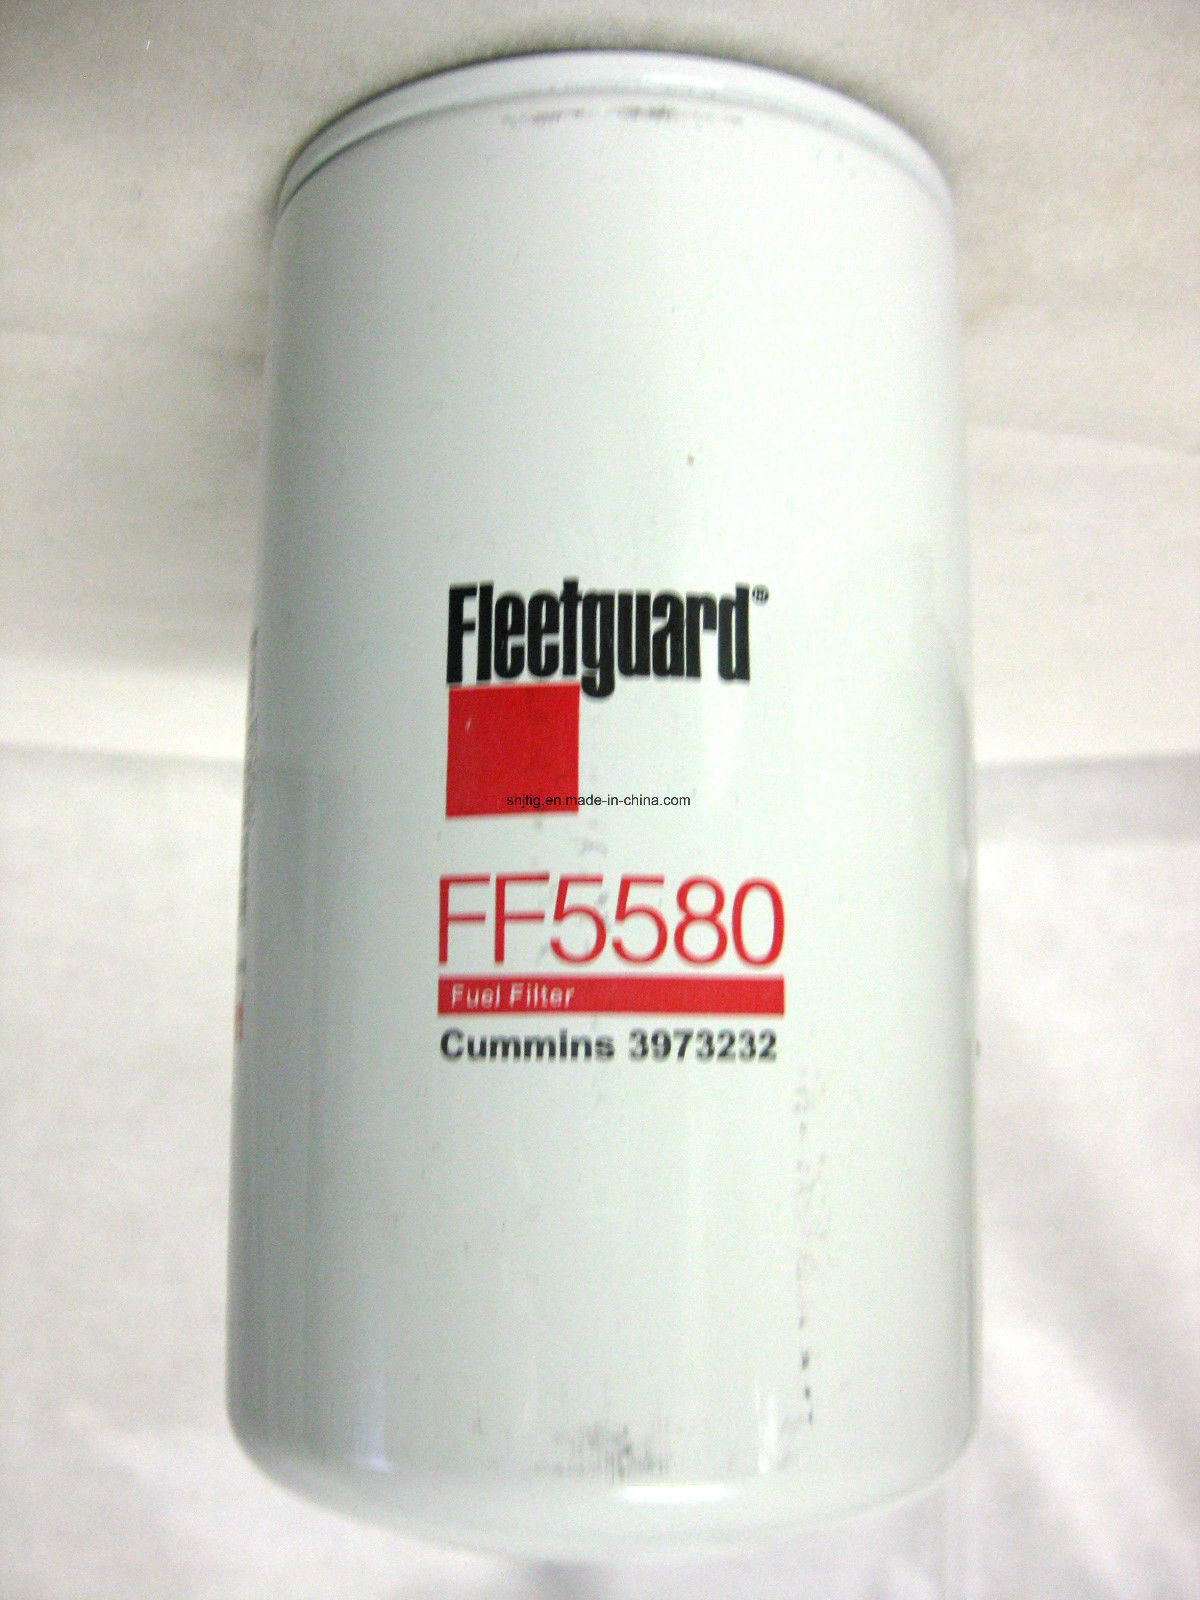 Fleetguard Fuel Filter FF5580 Cummins Qsc, Qsl Tier 3 Engines